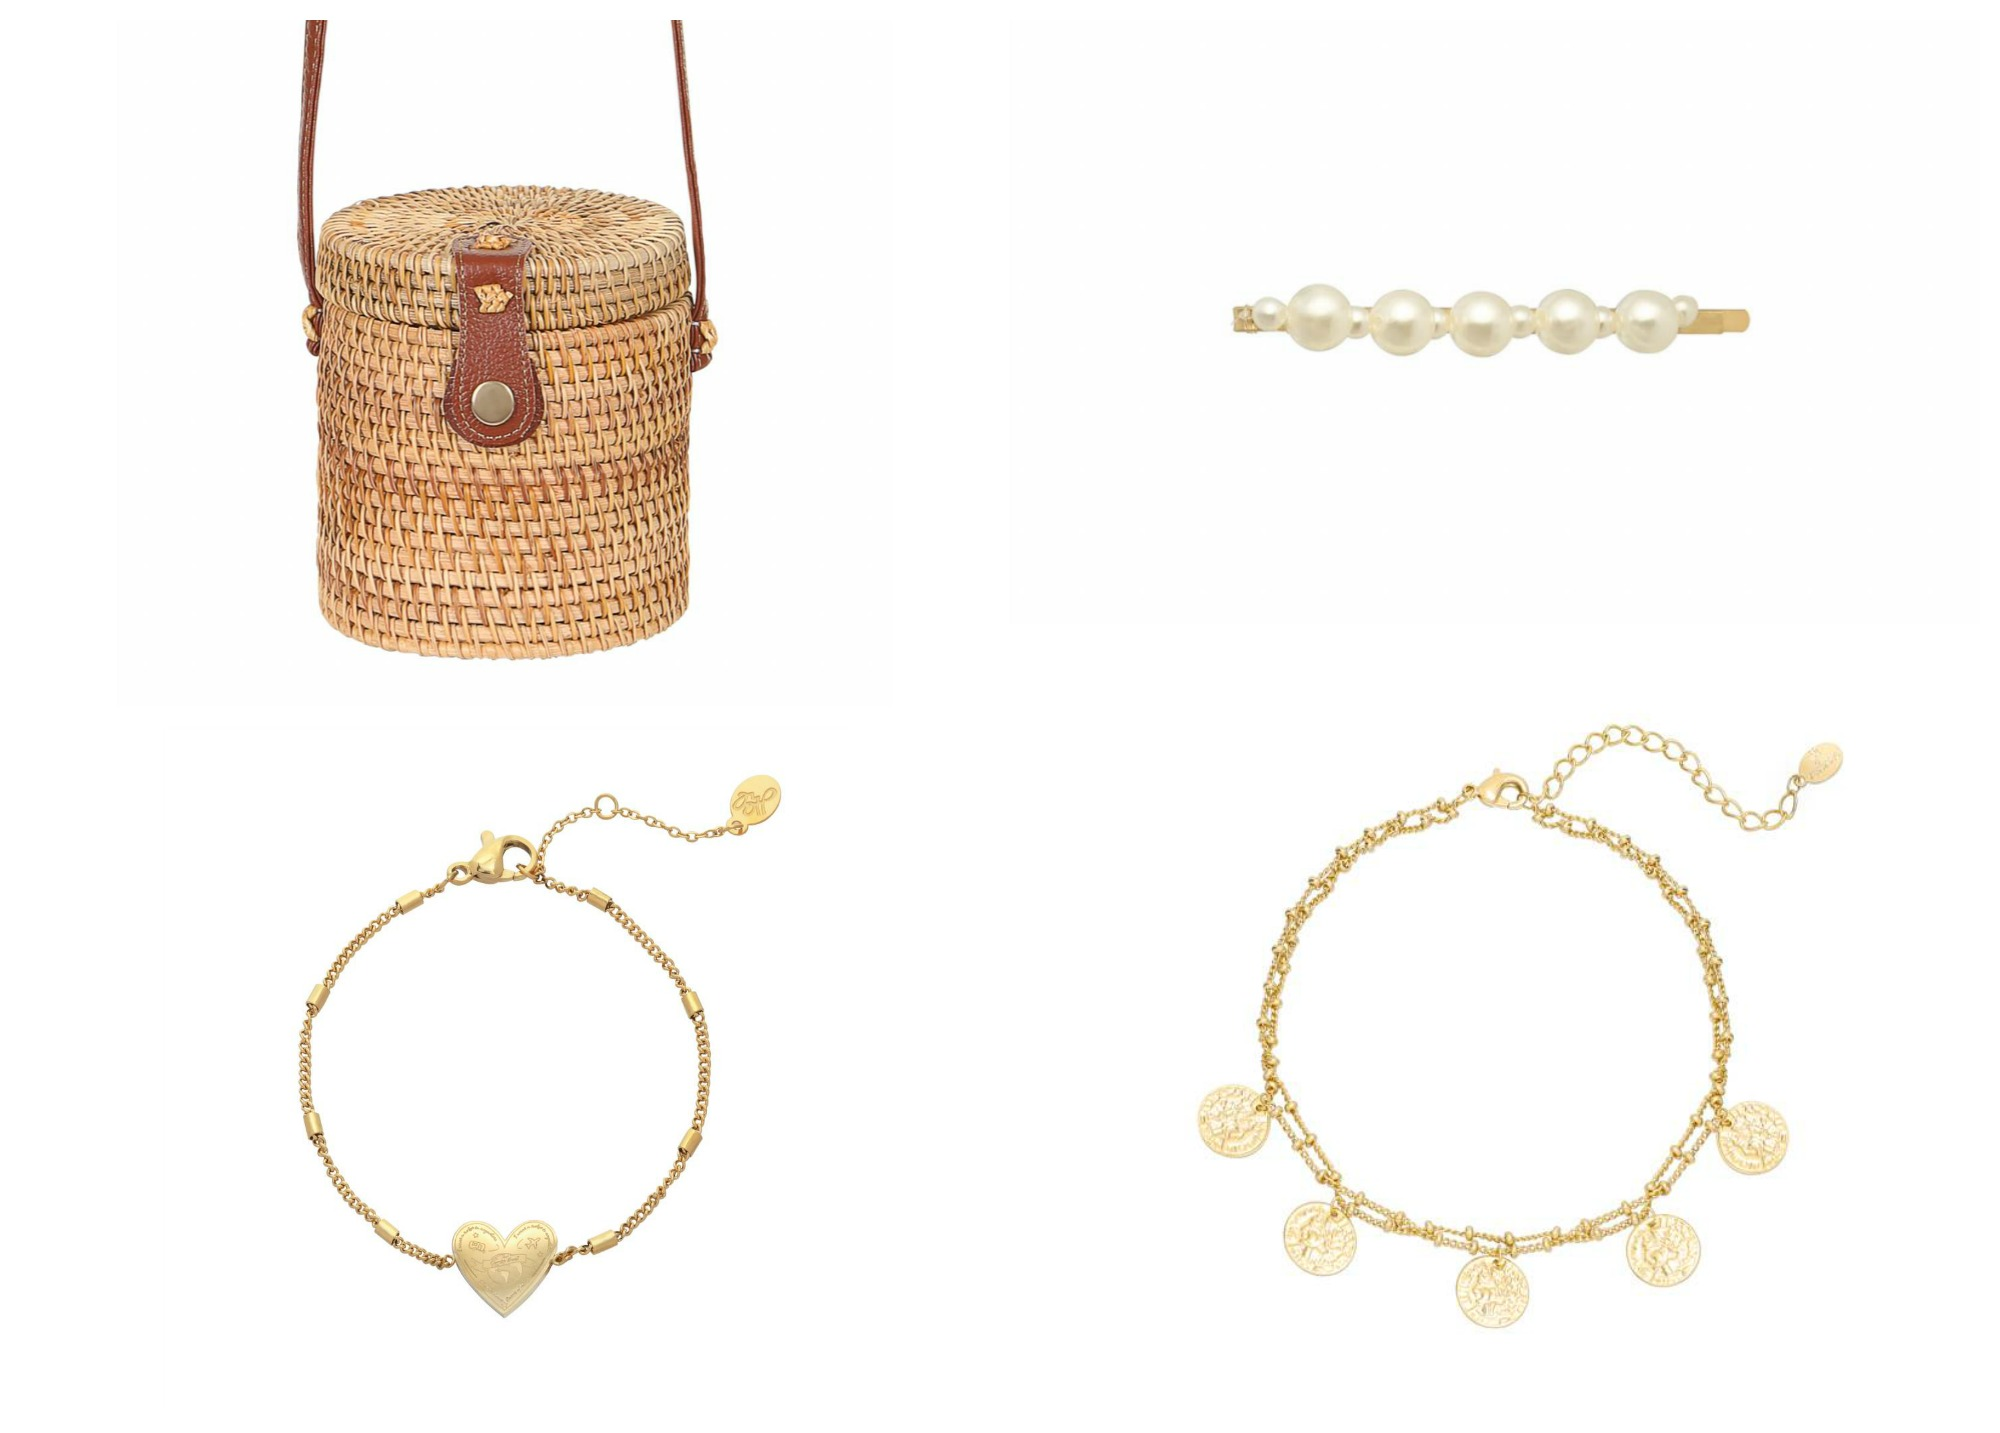 vintage look accessoires nostalgie sieraden haarband rieten tas